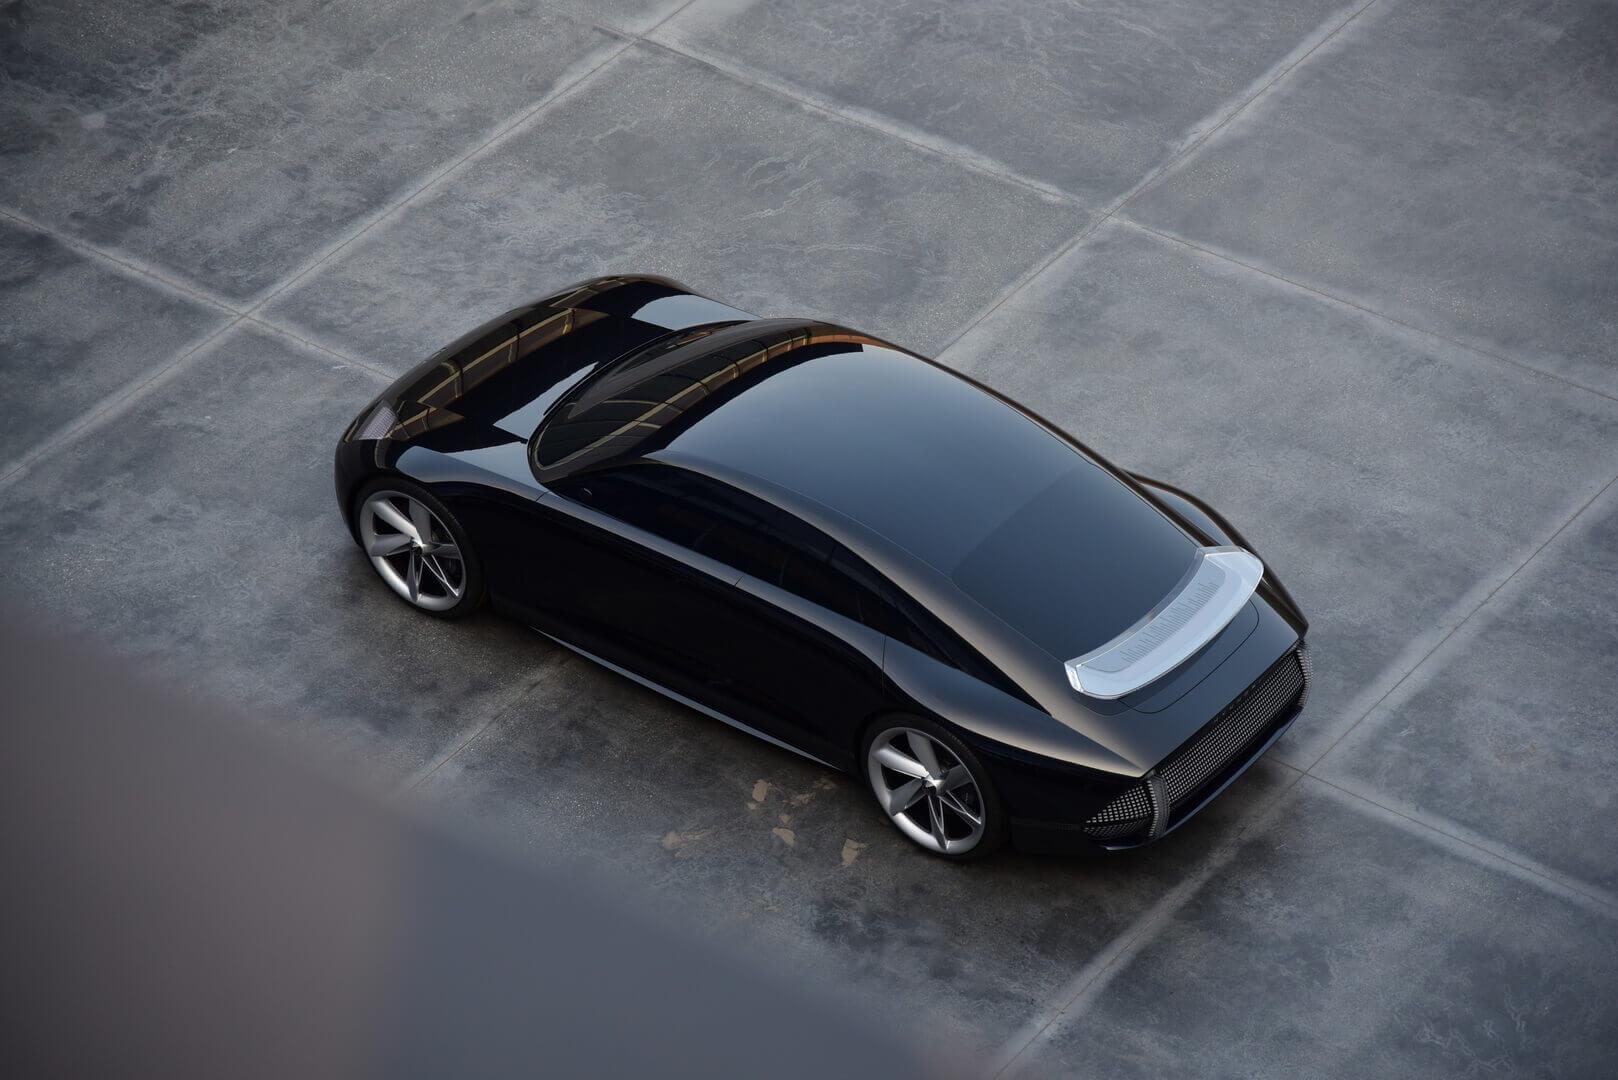 Представлена концепция футуристического электромобиля Hyundai Prophecy